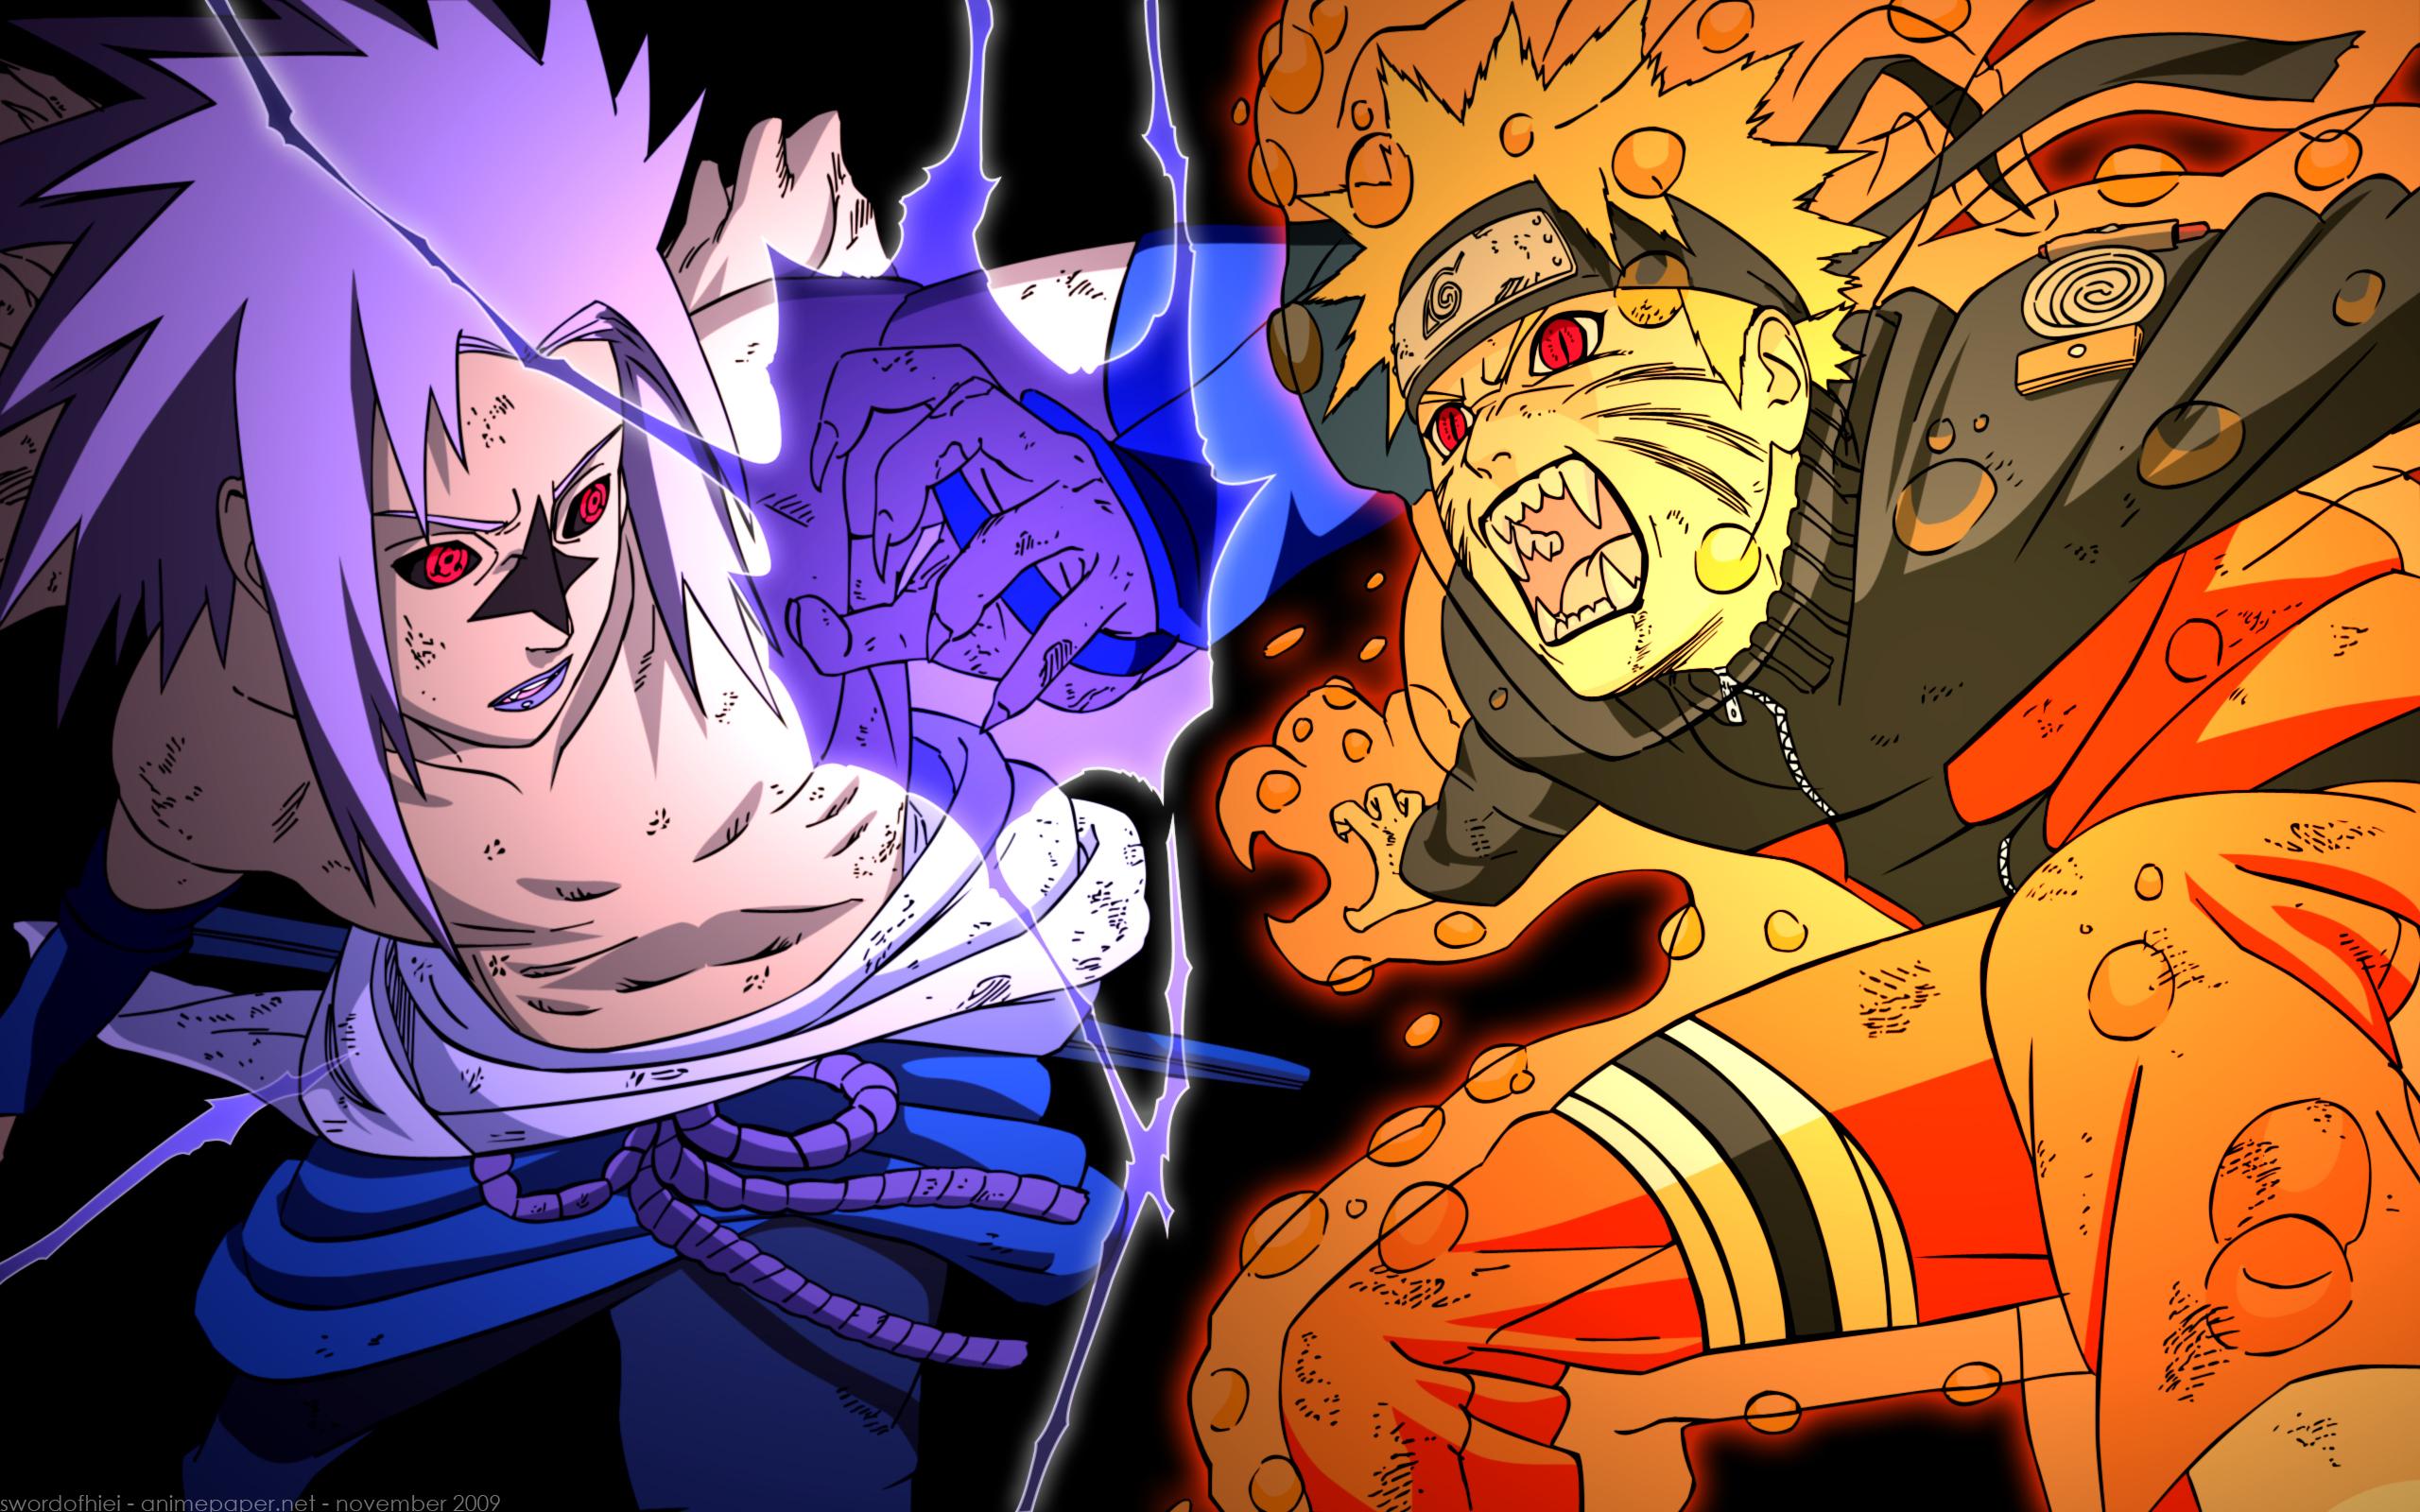 Naruto Res: 2560x1600 / Size:2476kb. Views: 18568